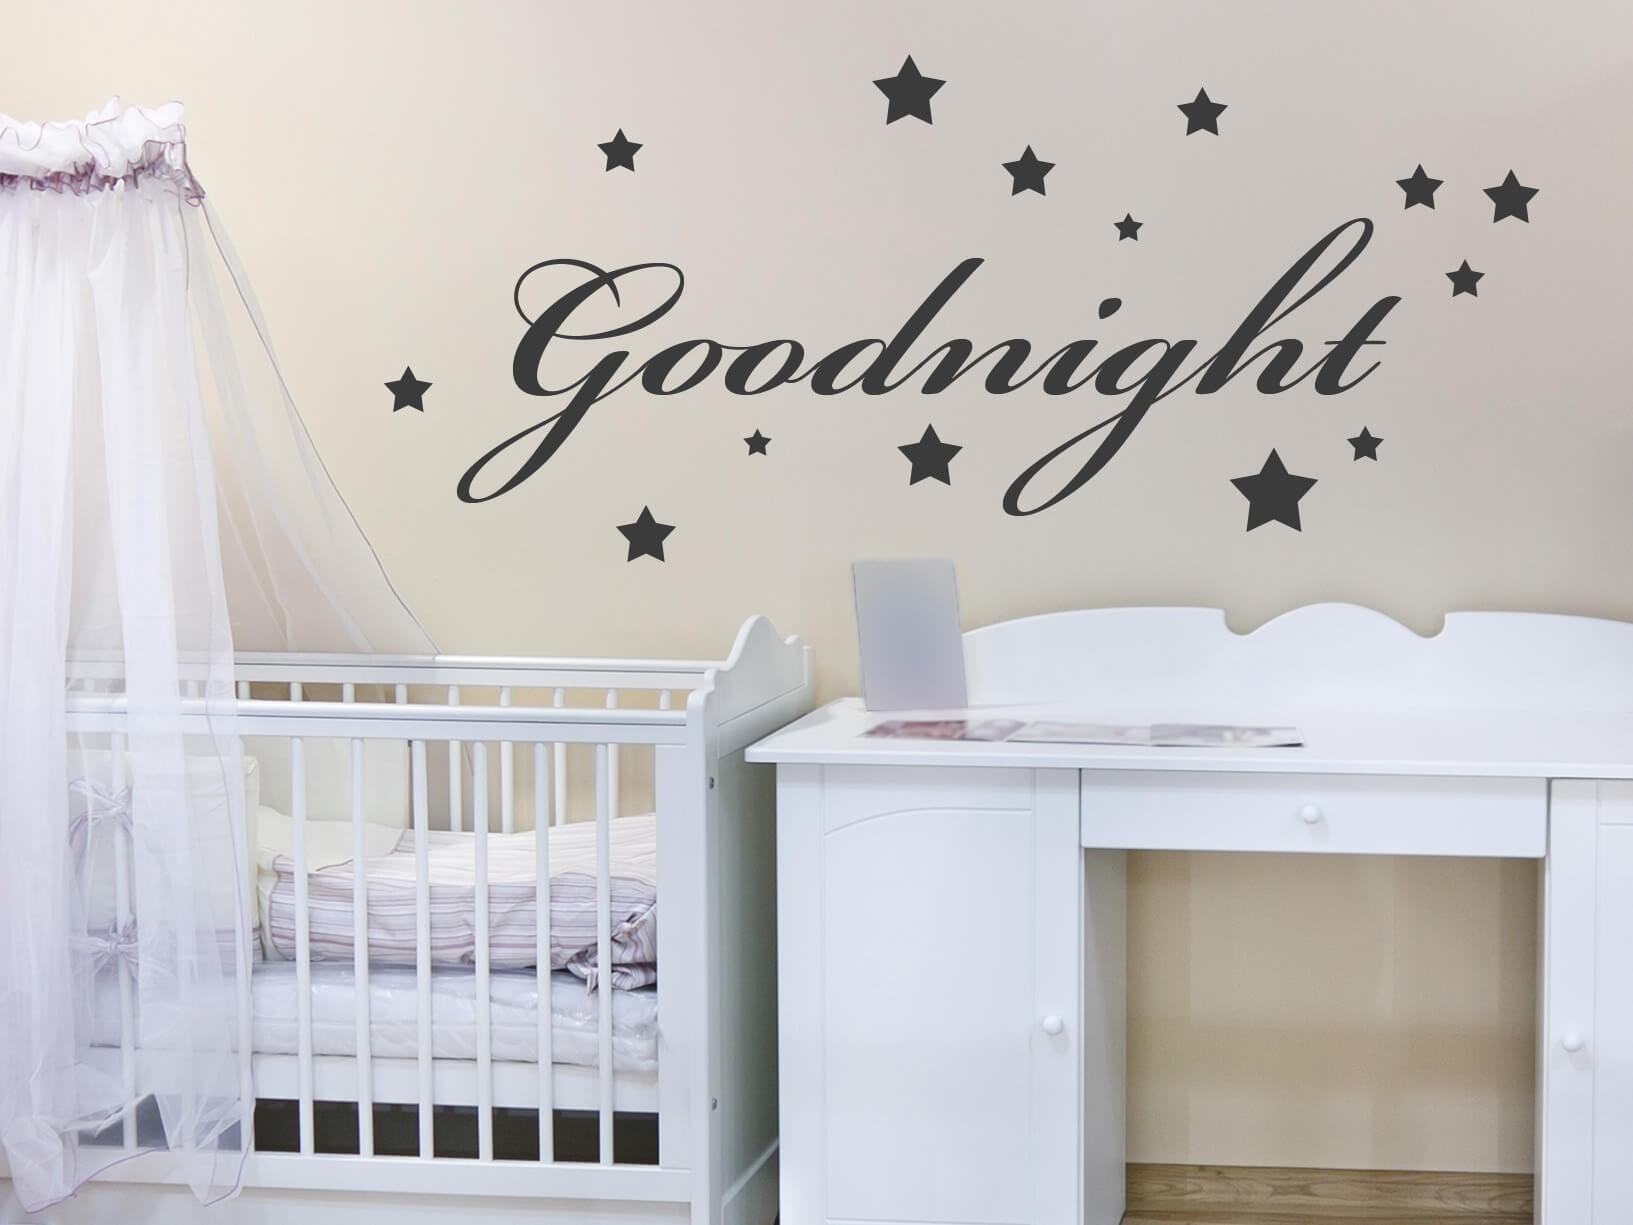 Muursticker Goodnight met sterren